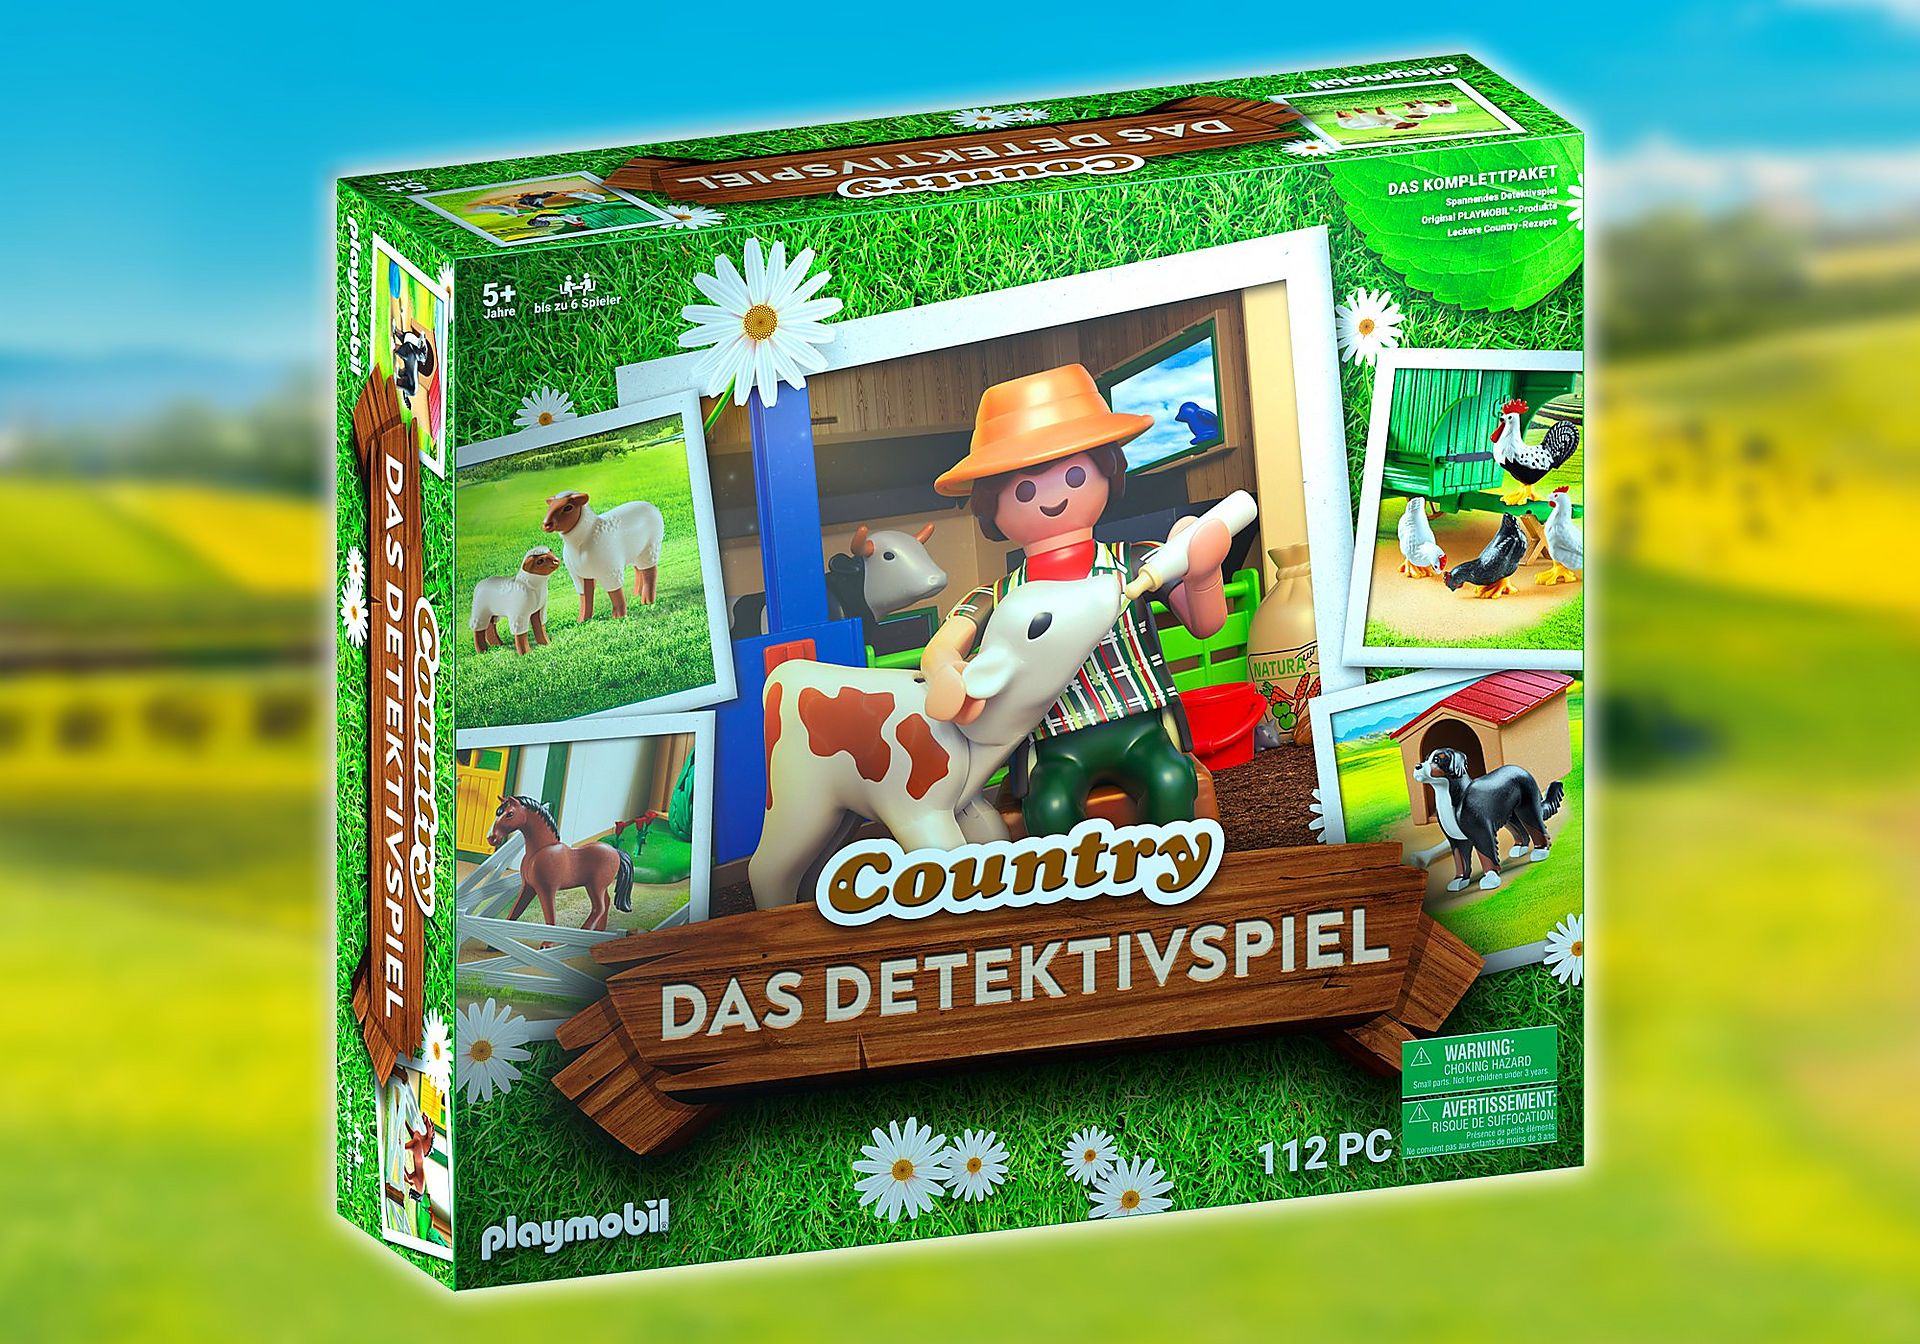 70763 PLAYMOBIL®Box: COUNTRY Das Detektivspiel Das Familienevent zoom image1